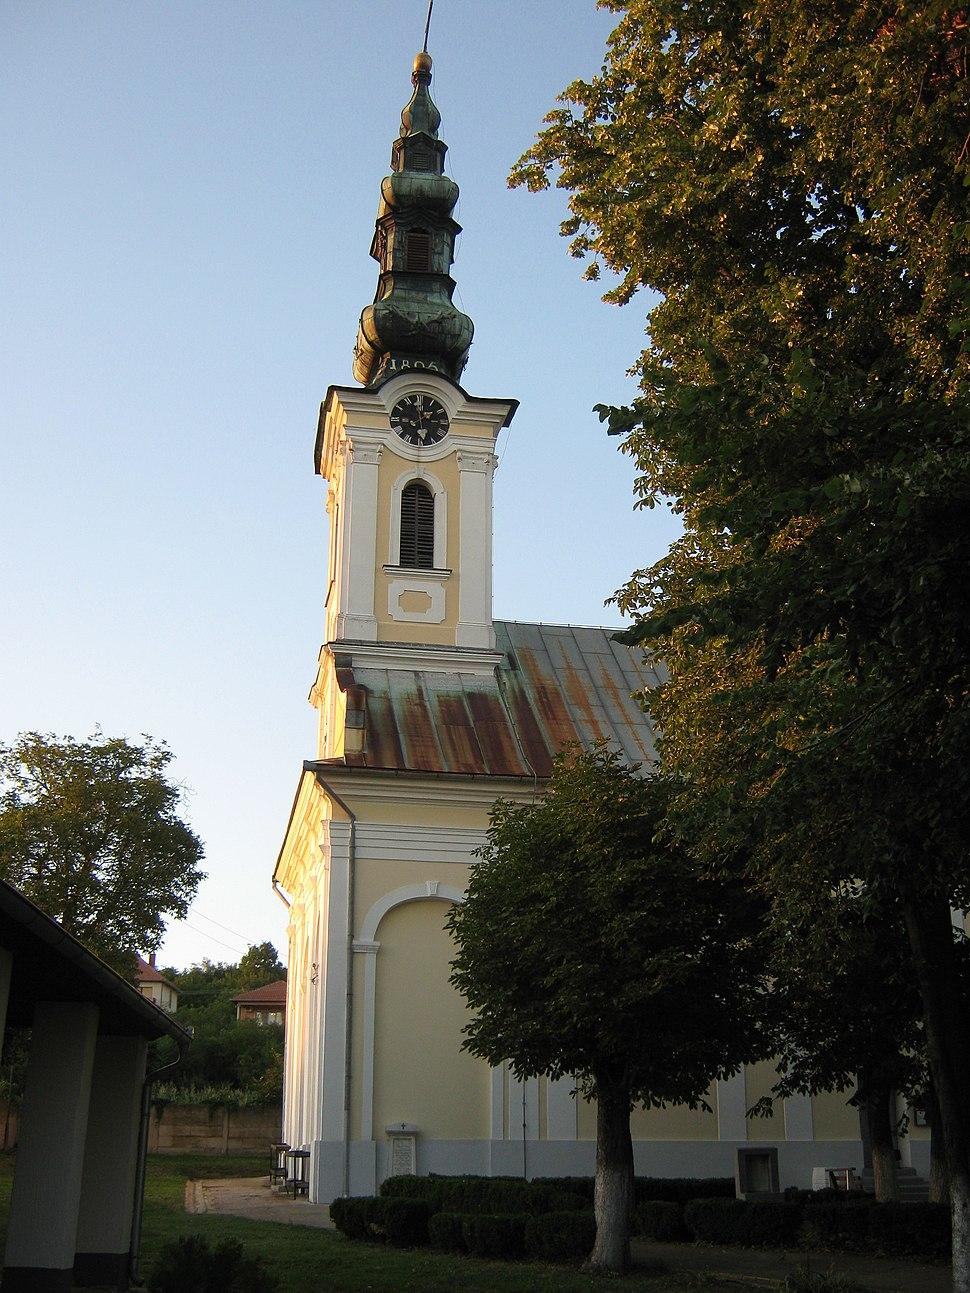 Српска православна црква Св. Петра и Павла у Белој Цркви